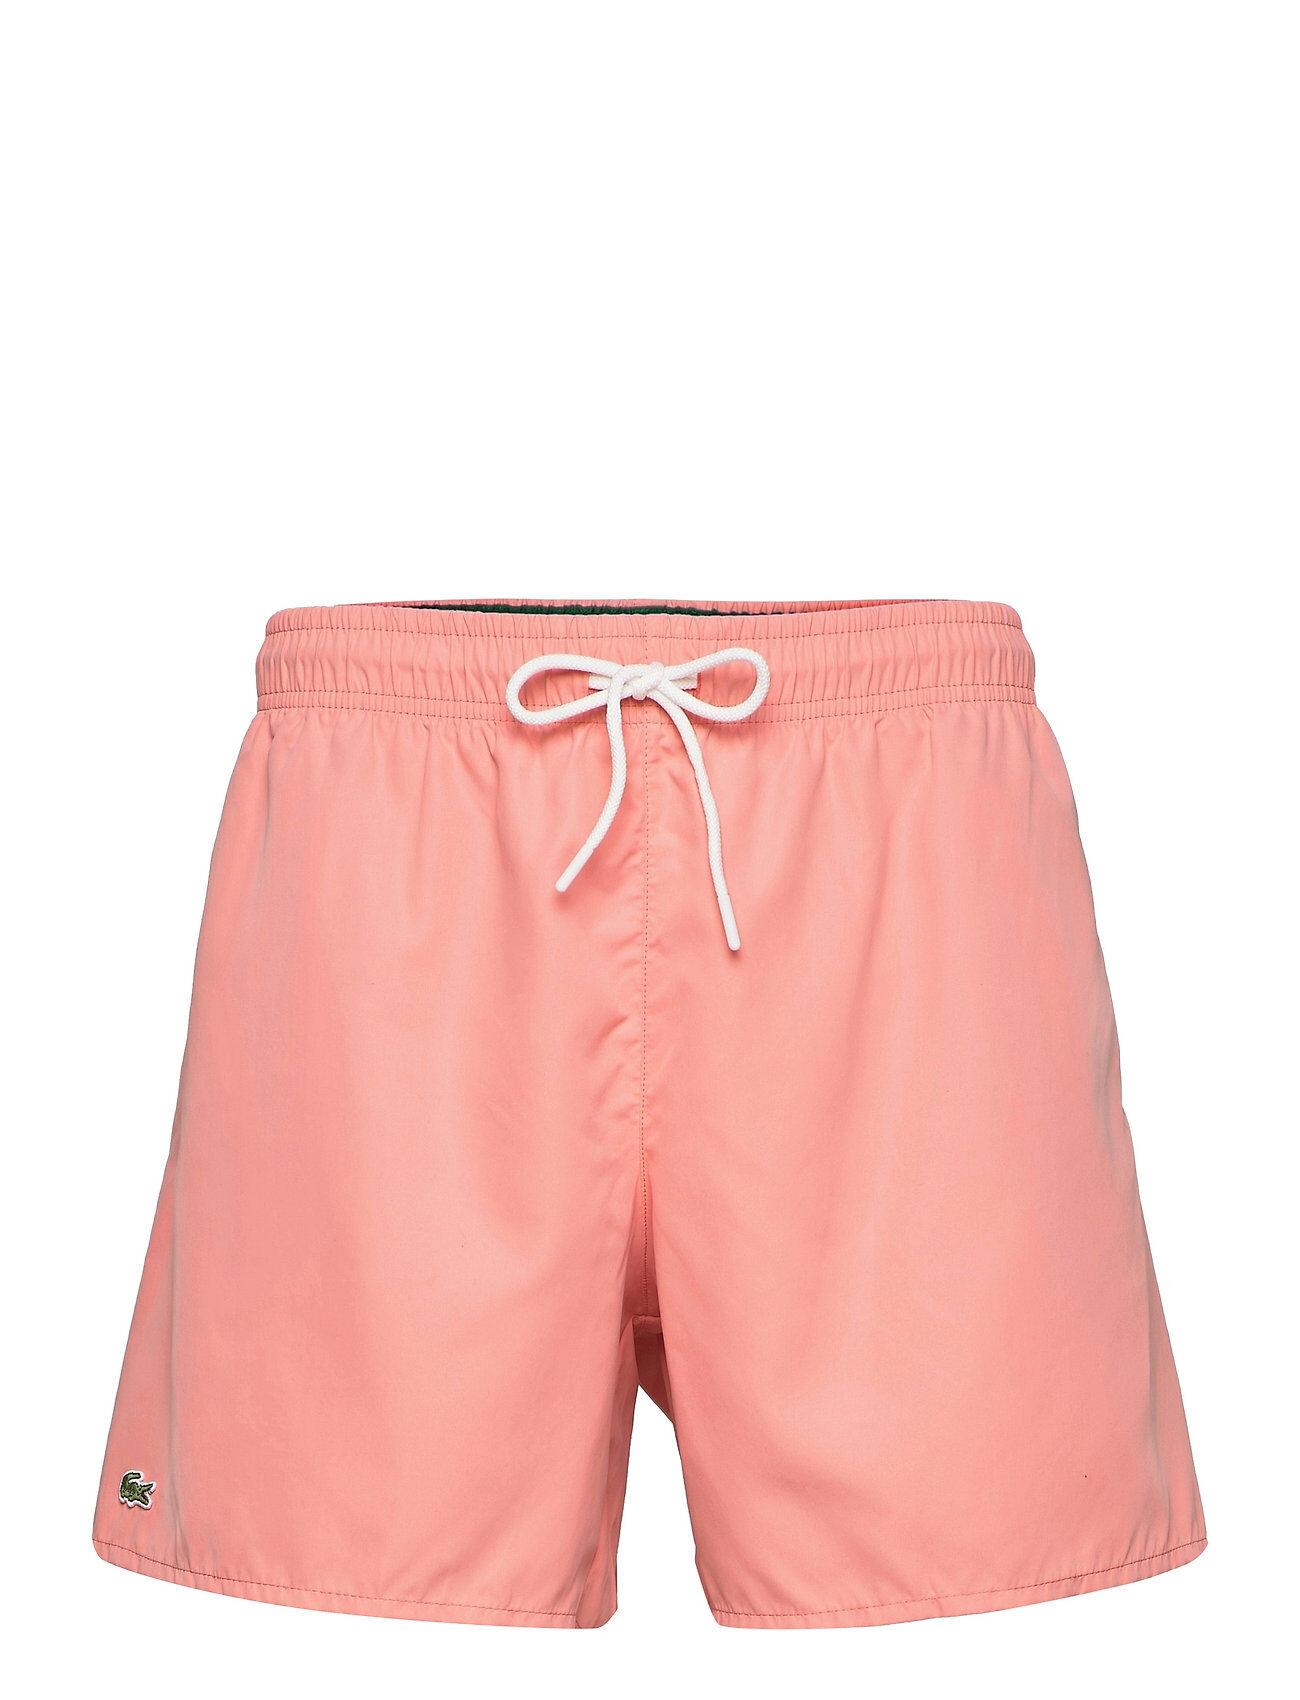 Lacoste Mens Swimwear Badeshorts Rosa Lacoste